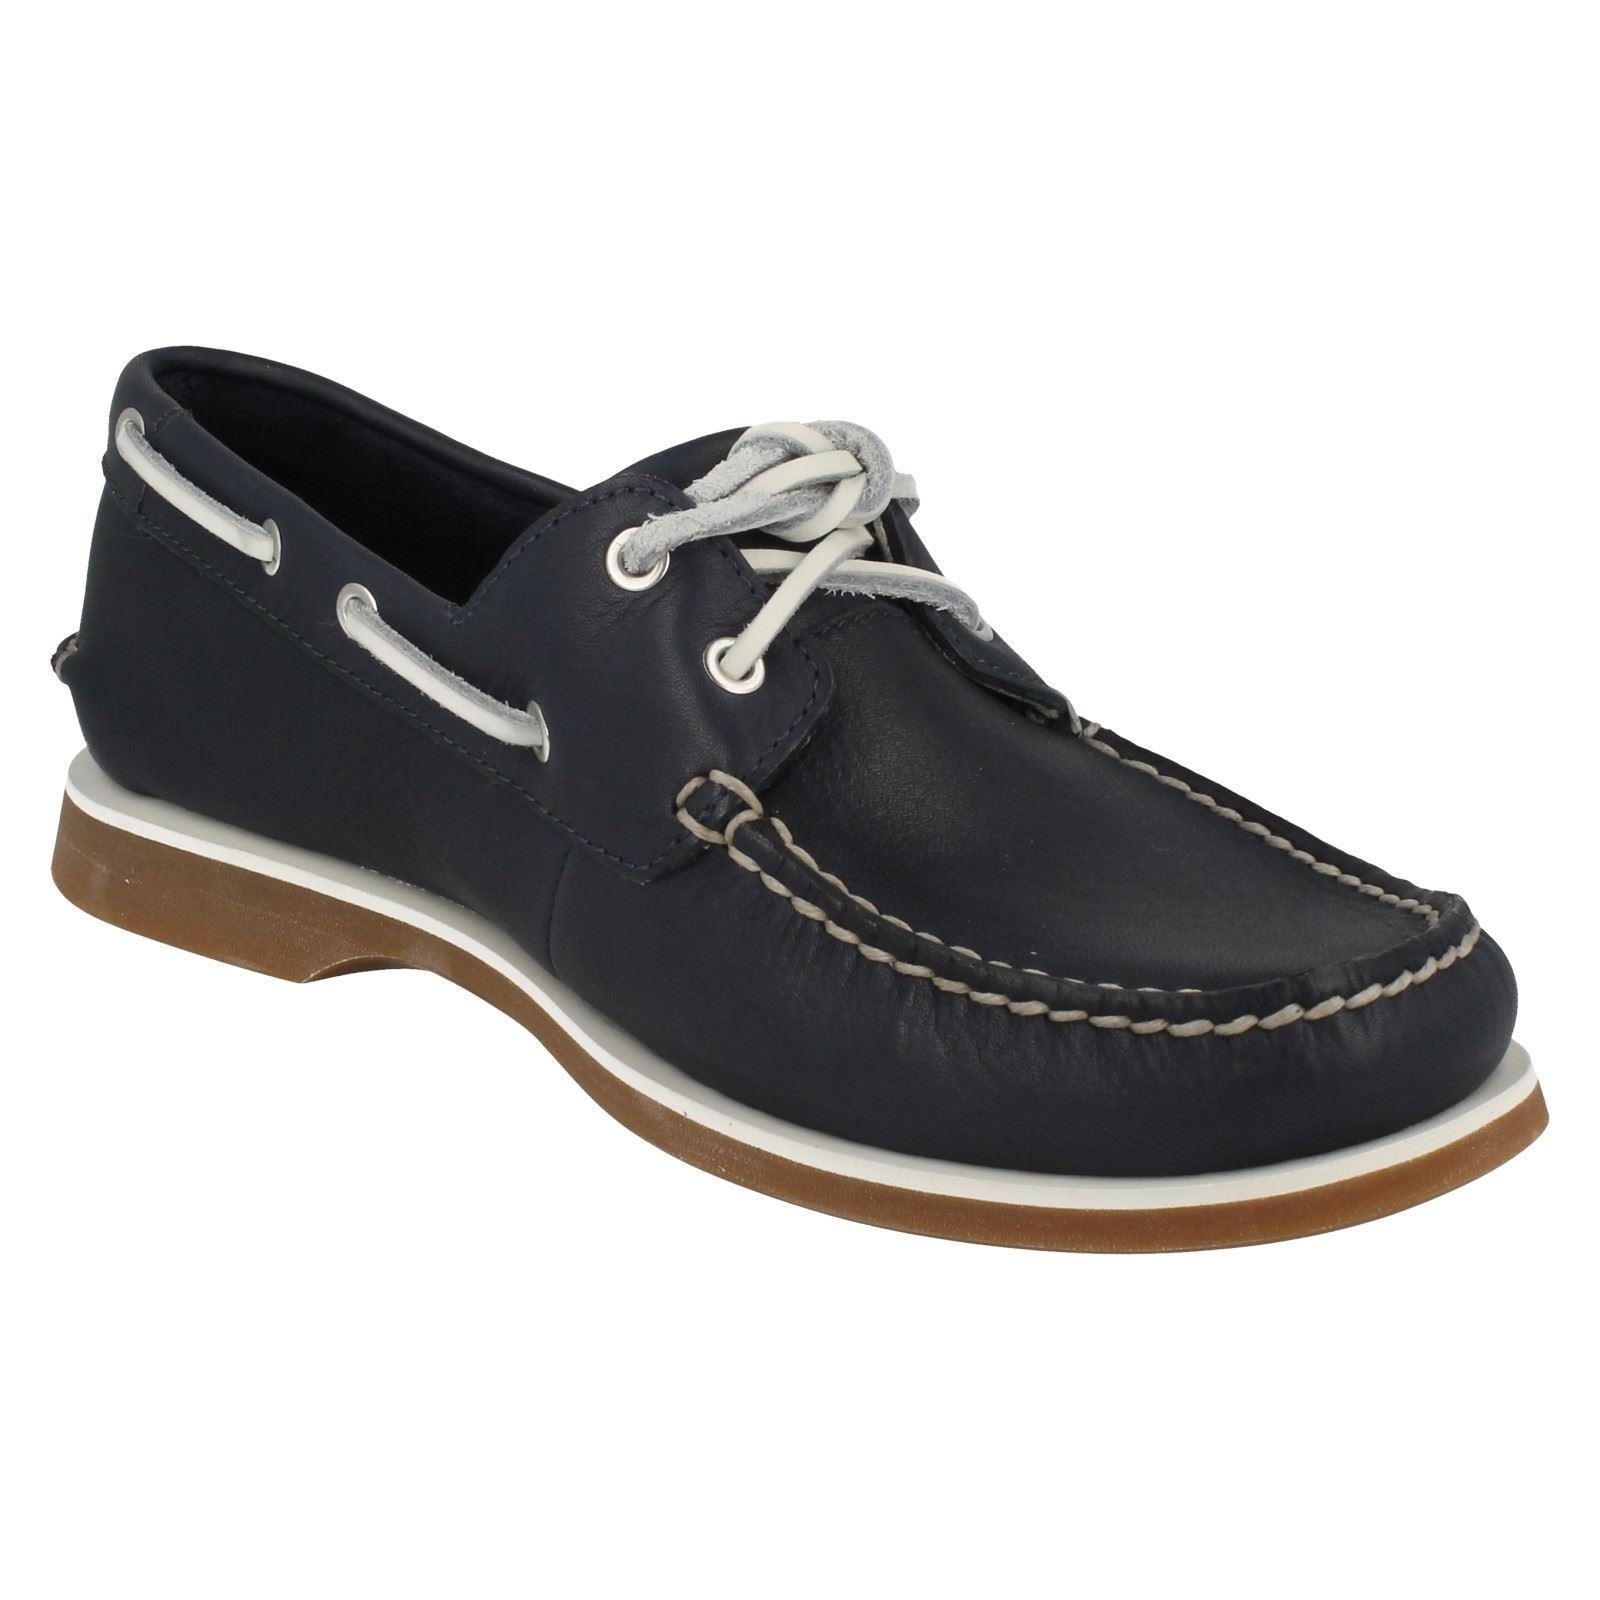 Clarks Mens Deck Boat Shoe